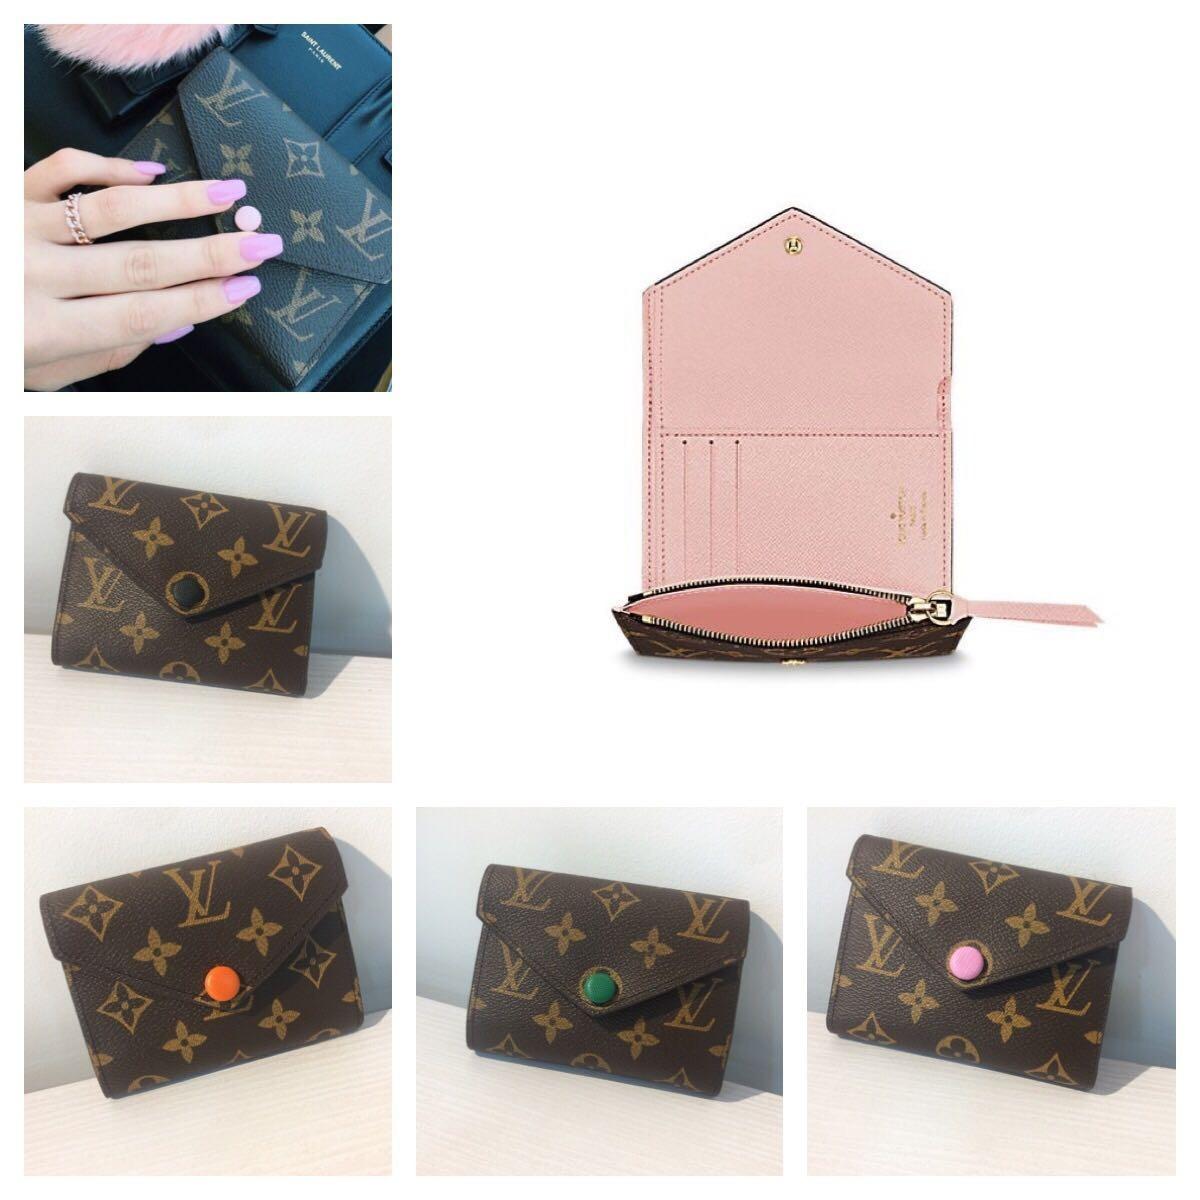 d795f642e Billeteras Mini Louis Vuitton Lv Cuero Envío Gratis - $ 129.500 en ...